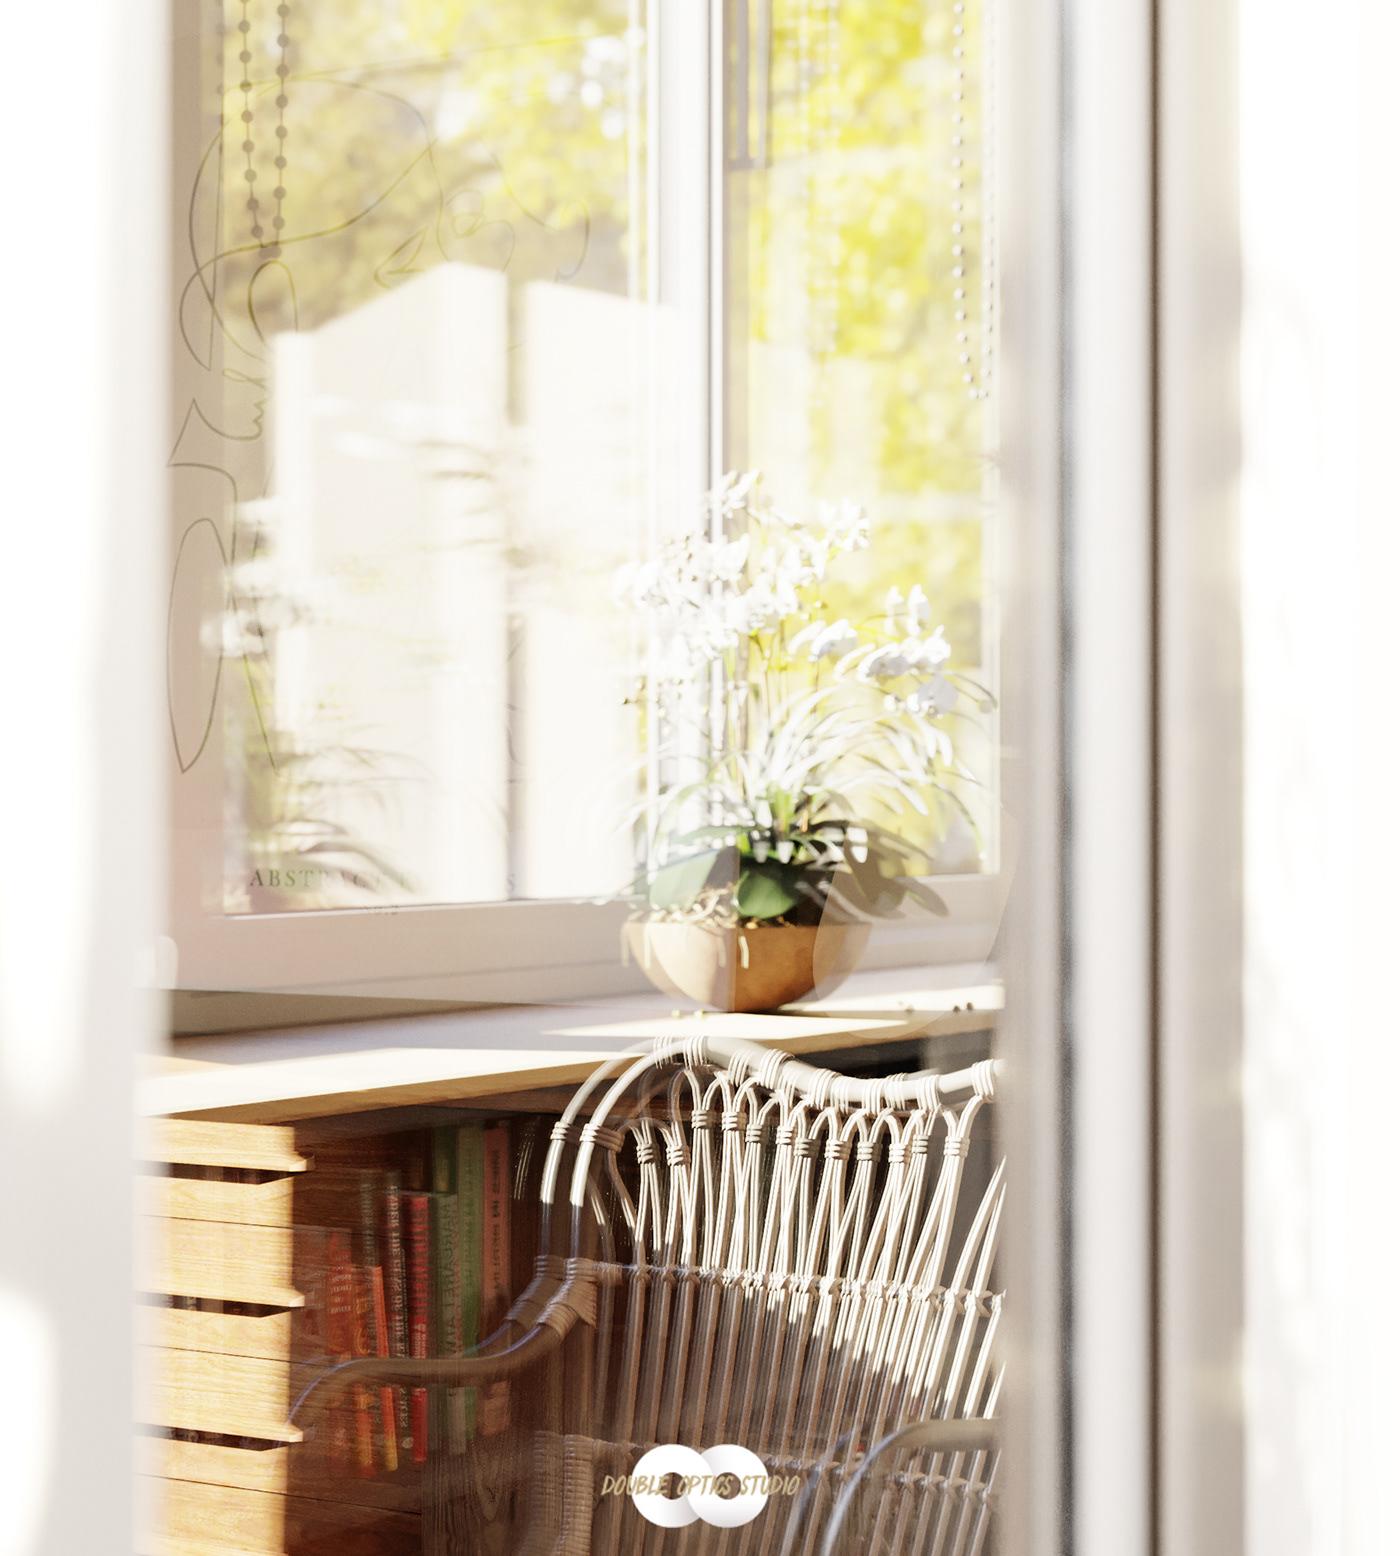 architecture architect apartment interior designer interior design  real estate Interior Photography Photography  design CGI